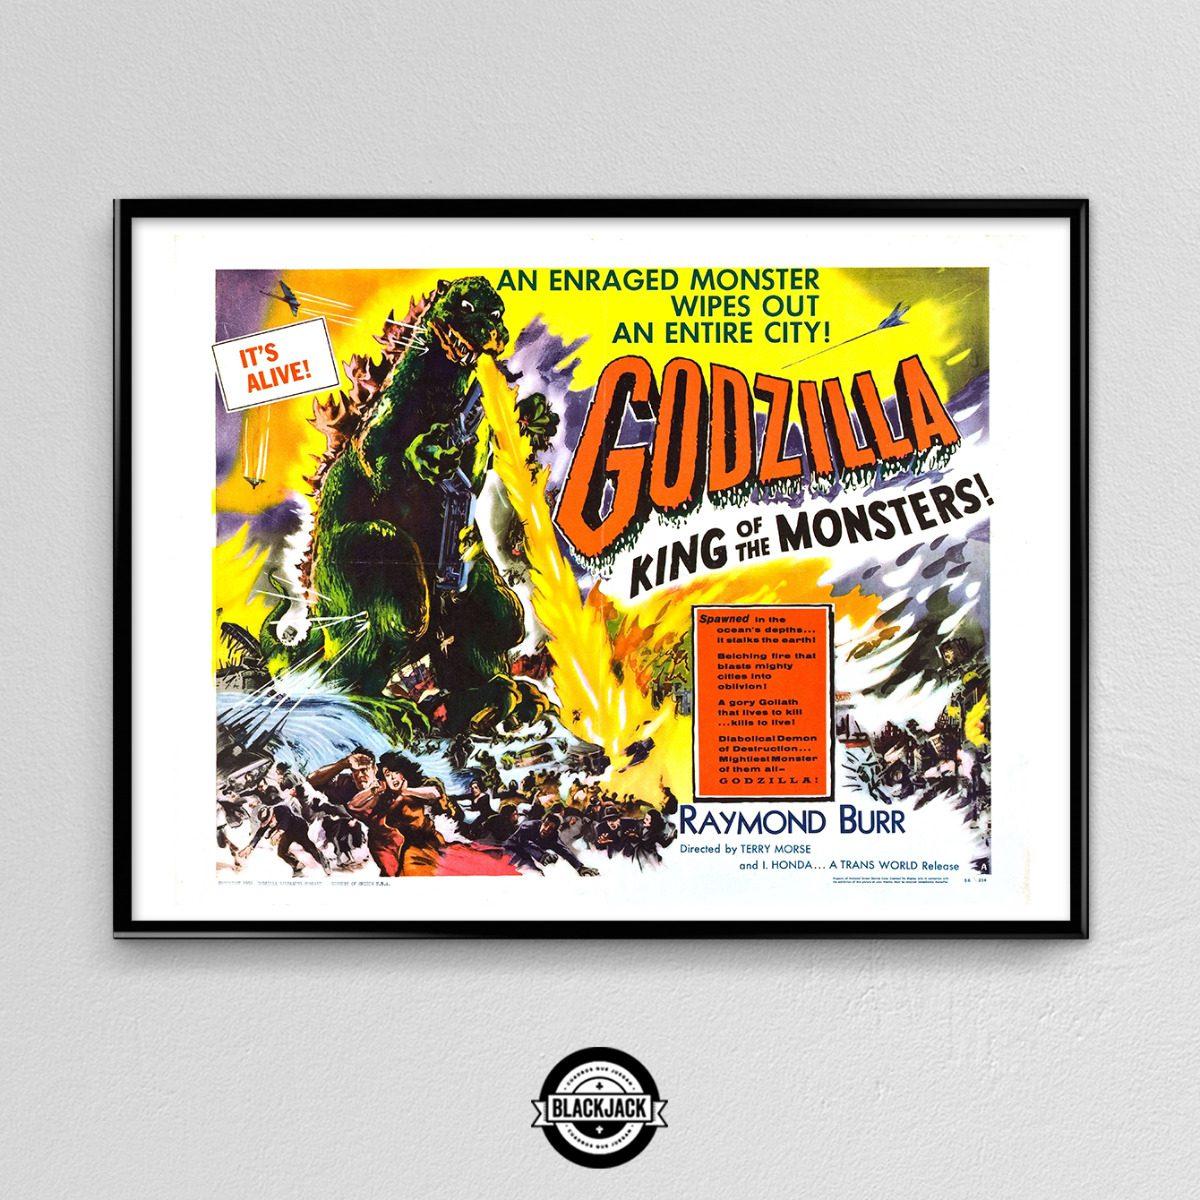 Cuadro 30x40 Marco Slim Godzilla Pelicula Cine Regalo Deco 4 - $ 499 ...